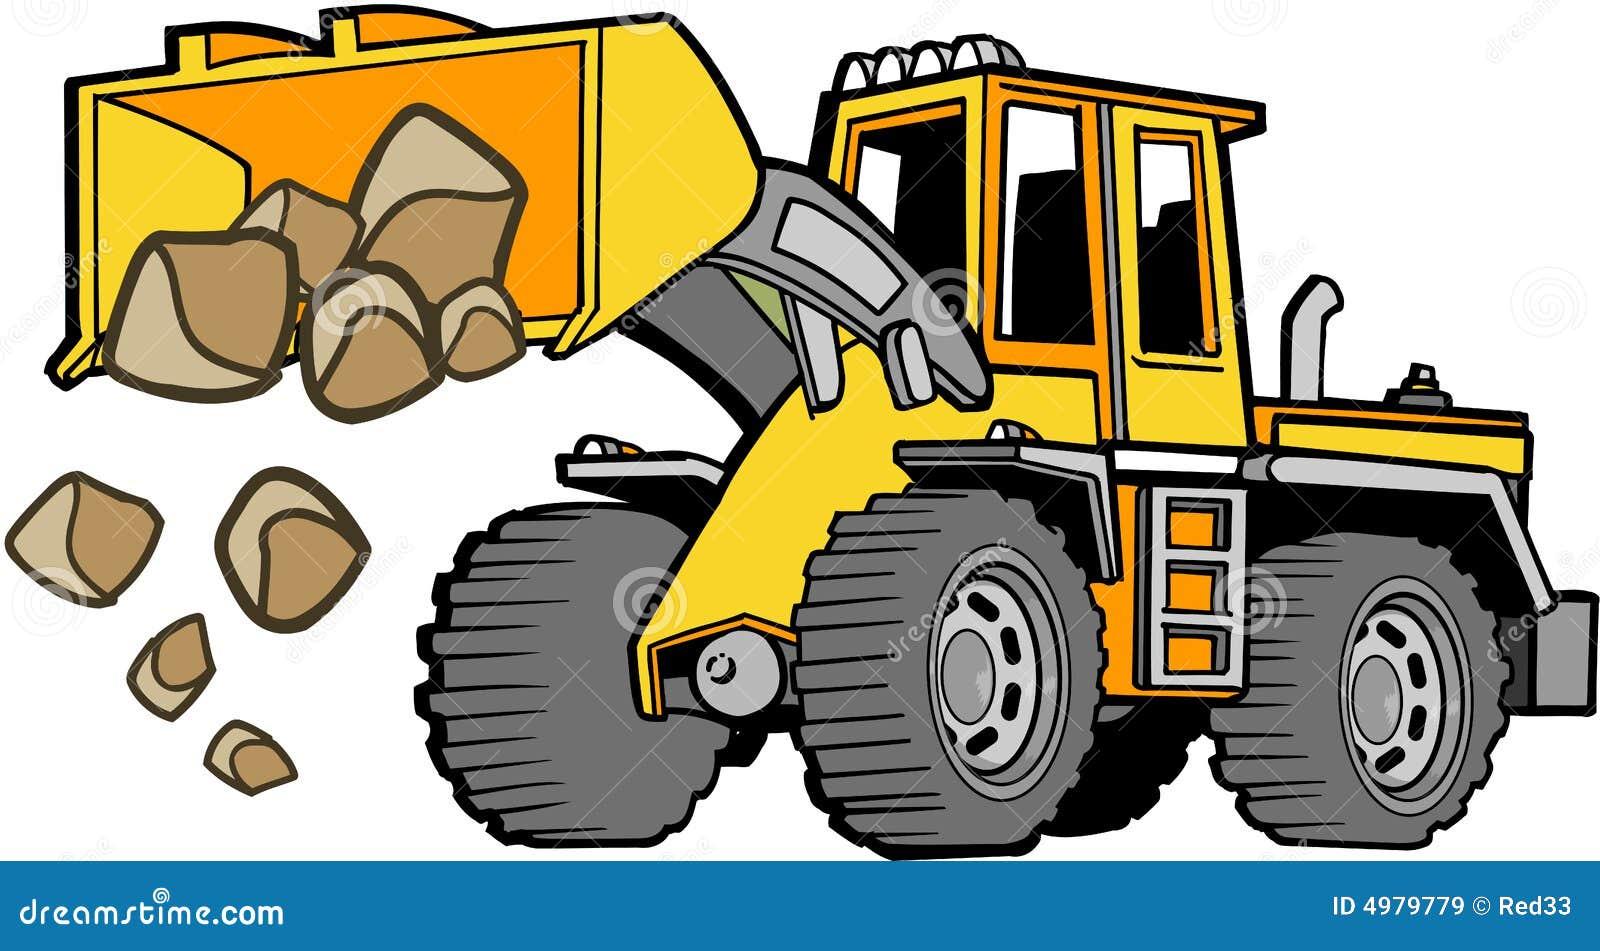 yellow truck clipart - photo #41